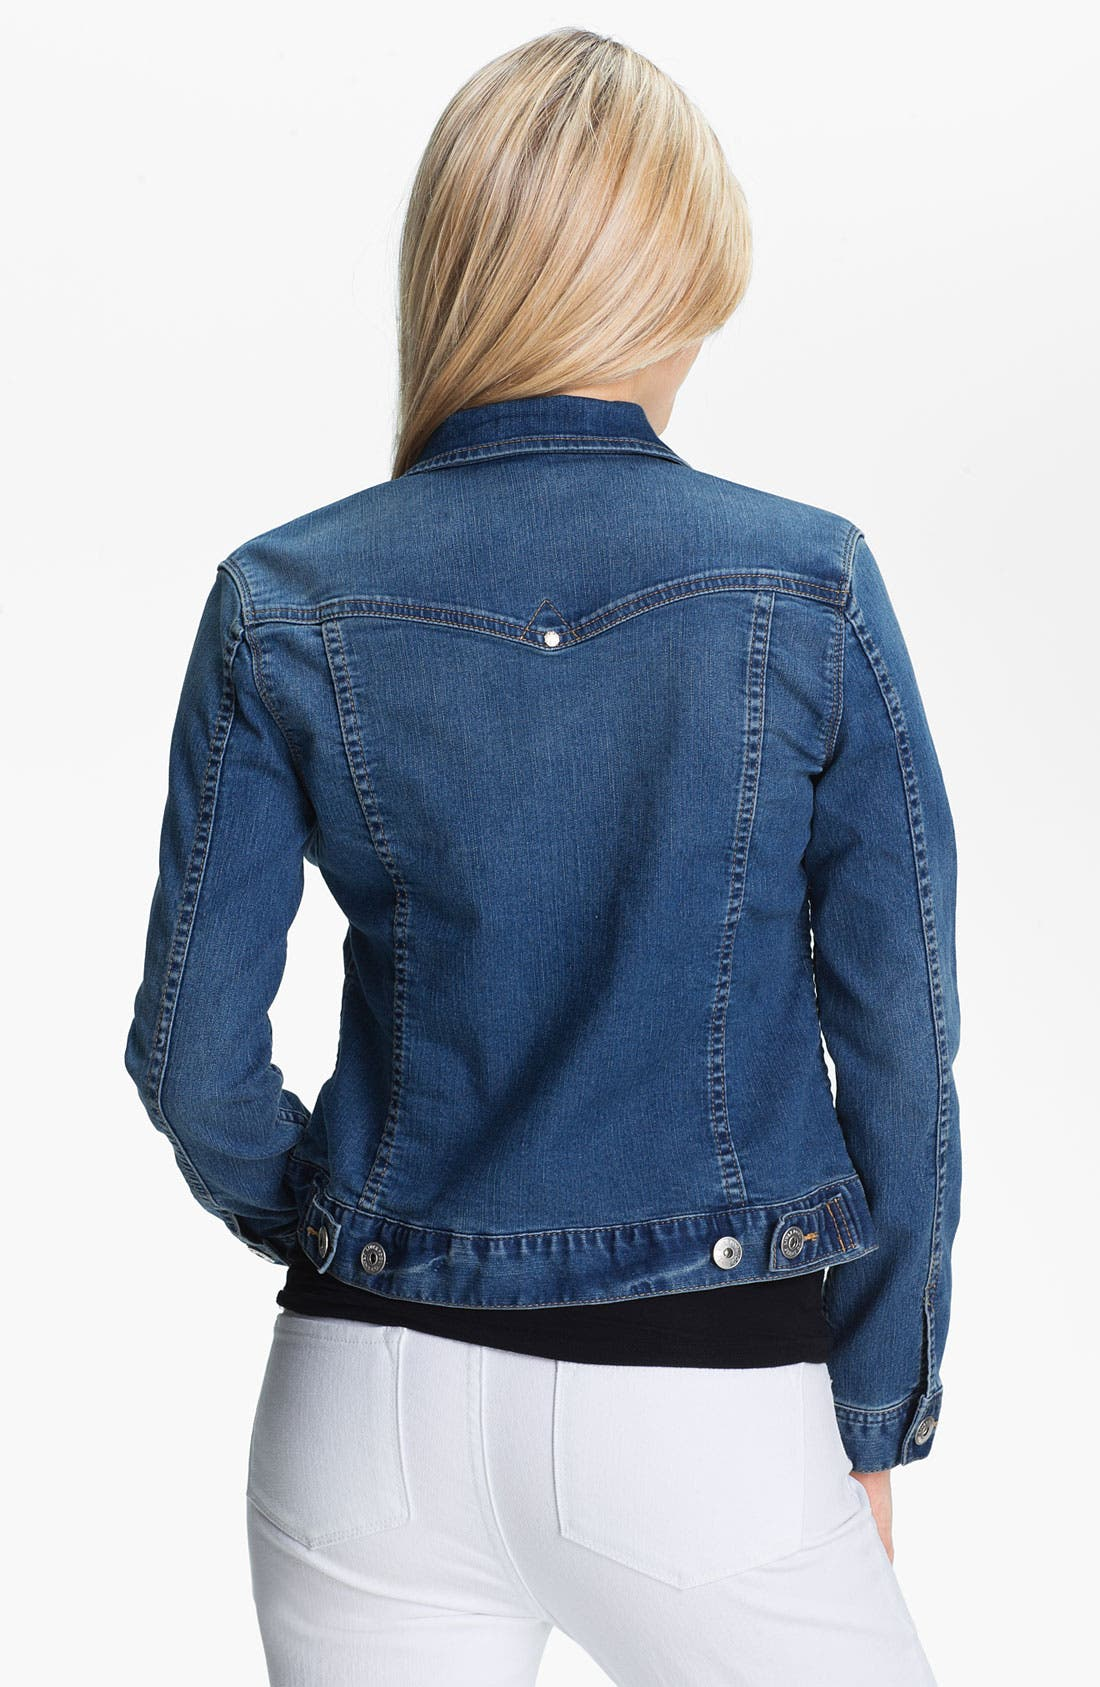 Alternate Image 2  - Liverpool Jeans Company 'Blue Jay Way' Denim Jacket